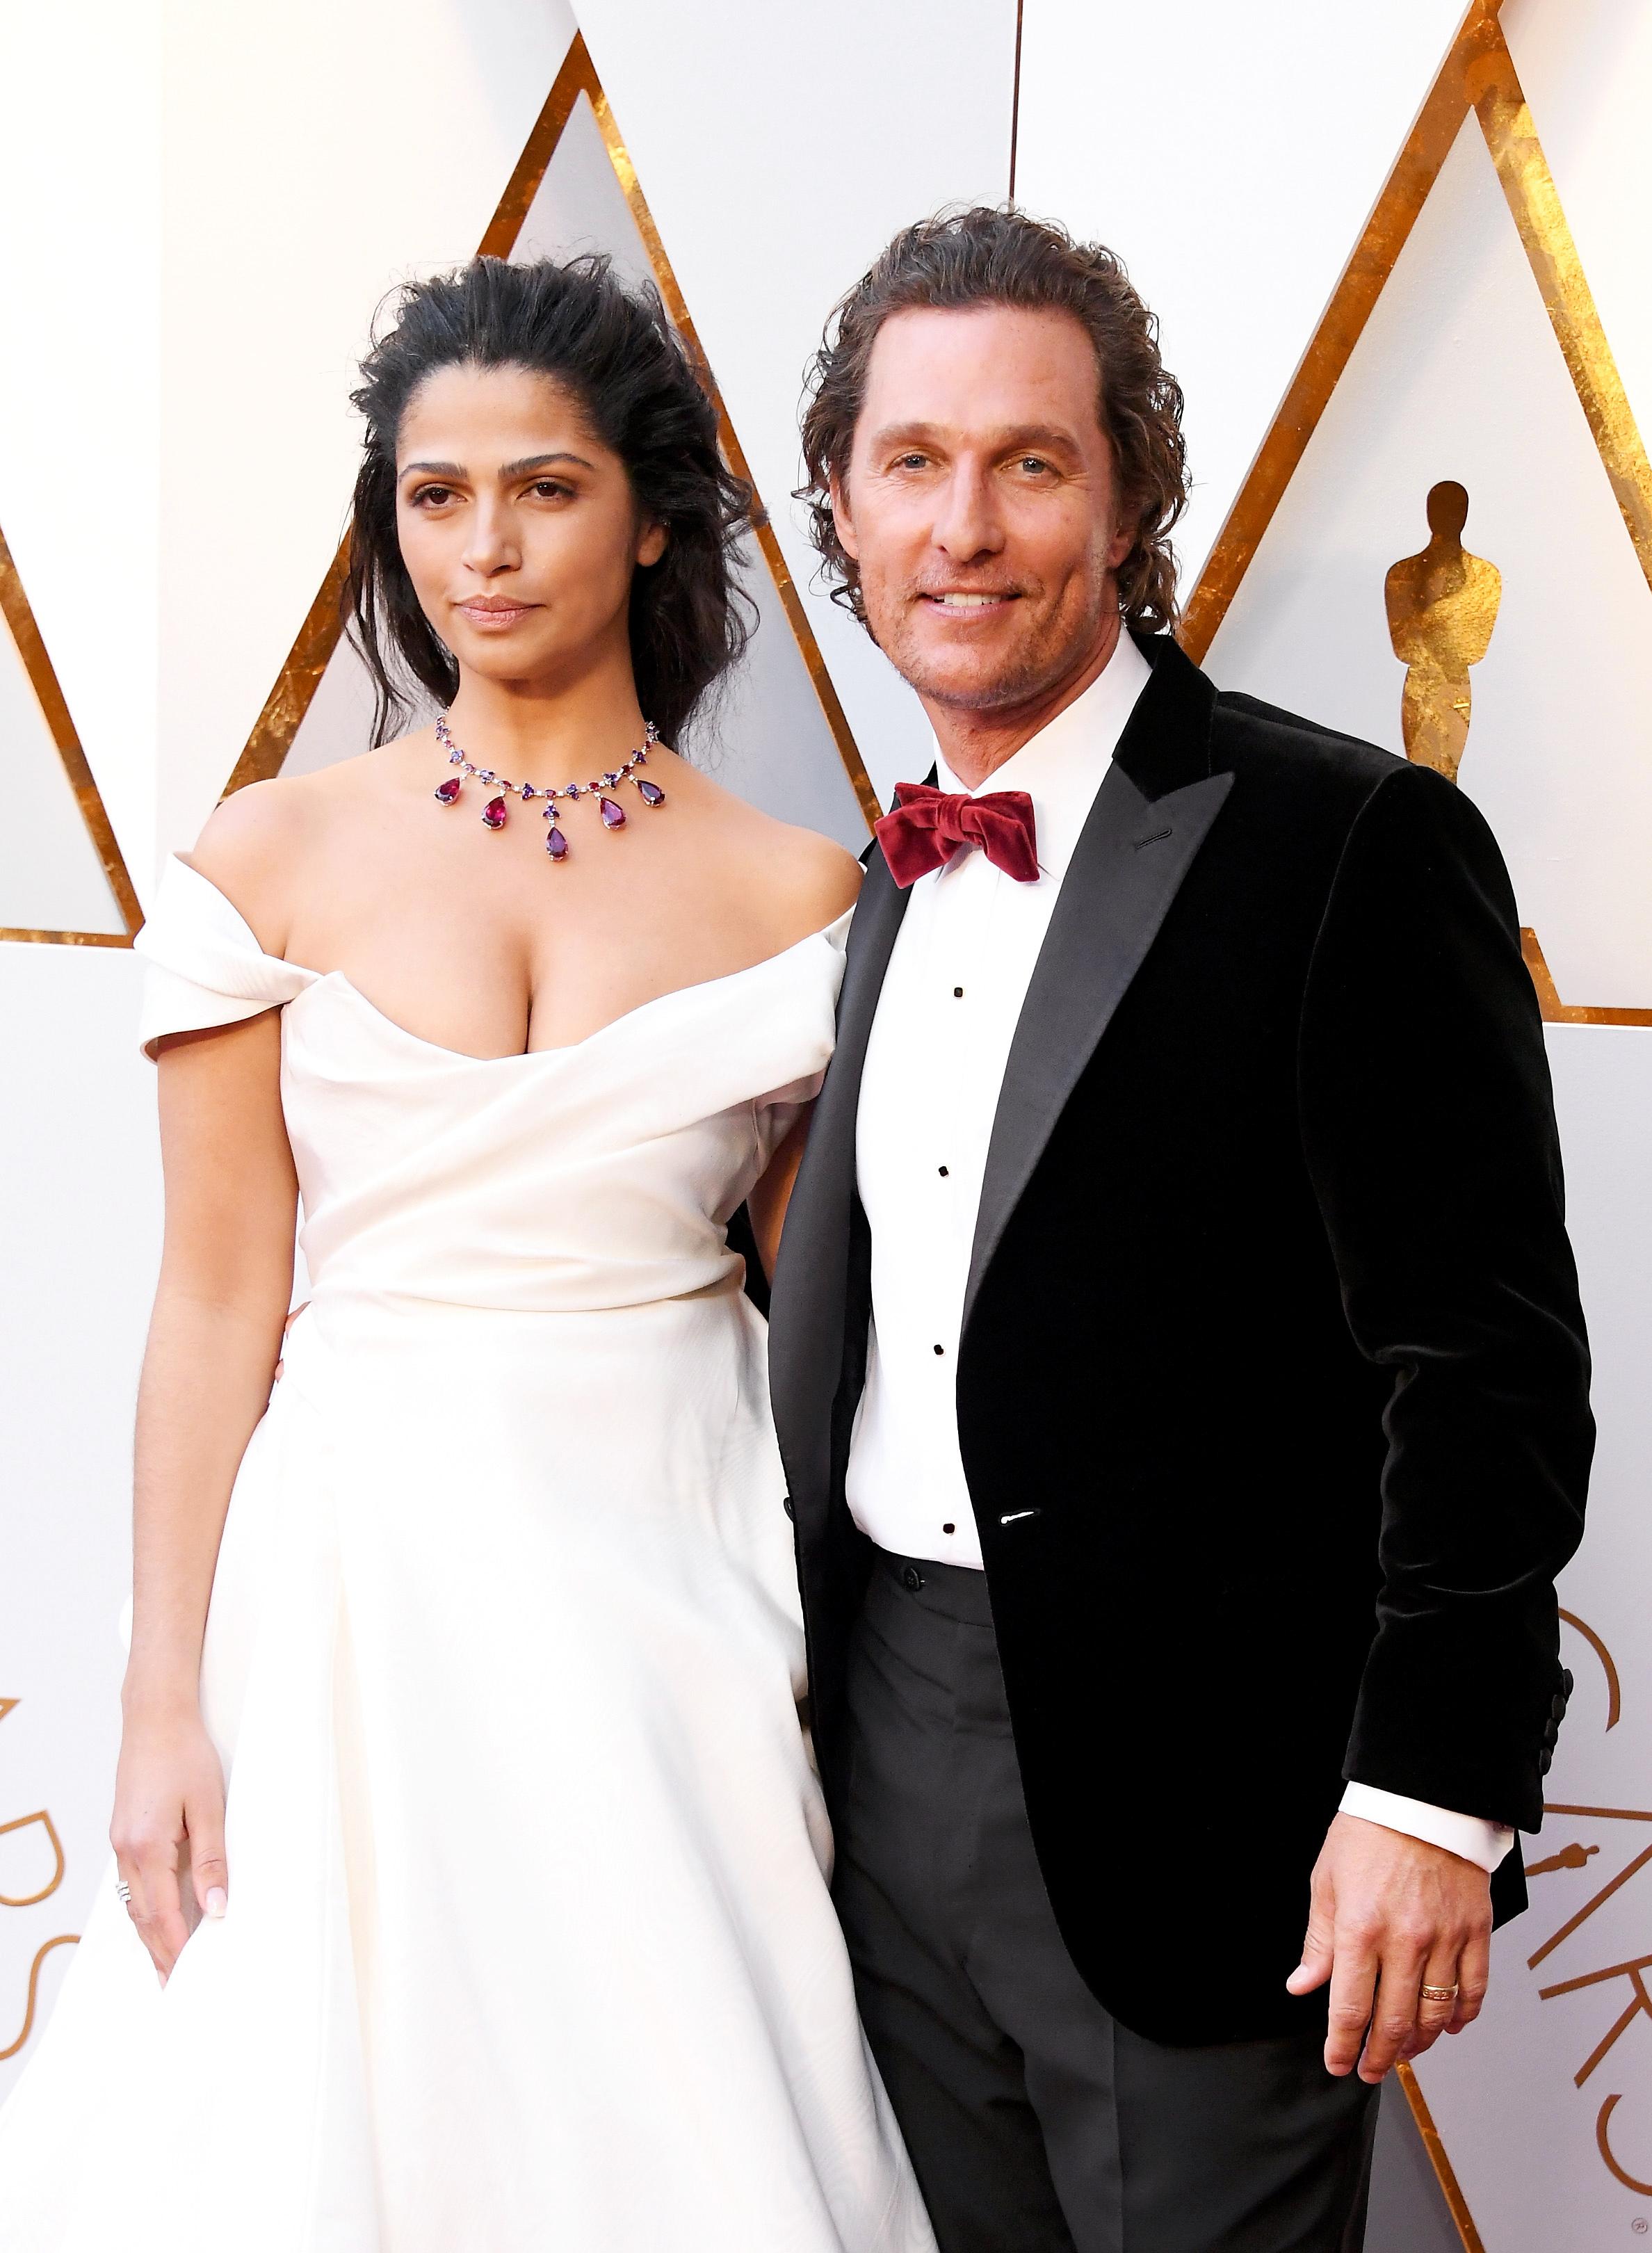 Matthew McConaughey and Camila Alves 2018 Oscars